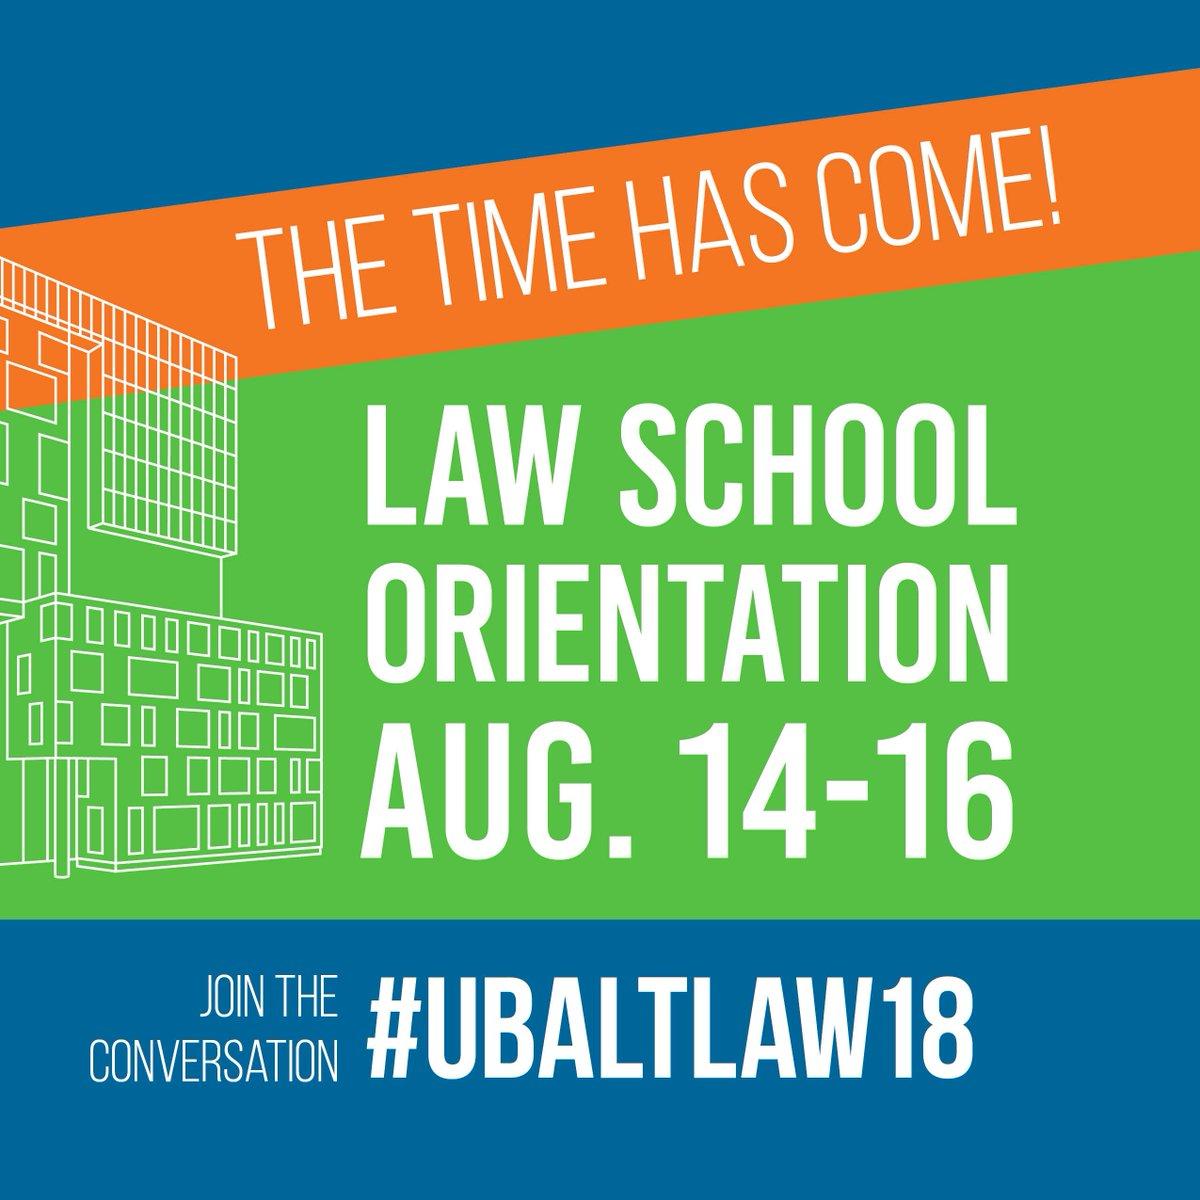 UB School of Law on Twitter: